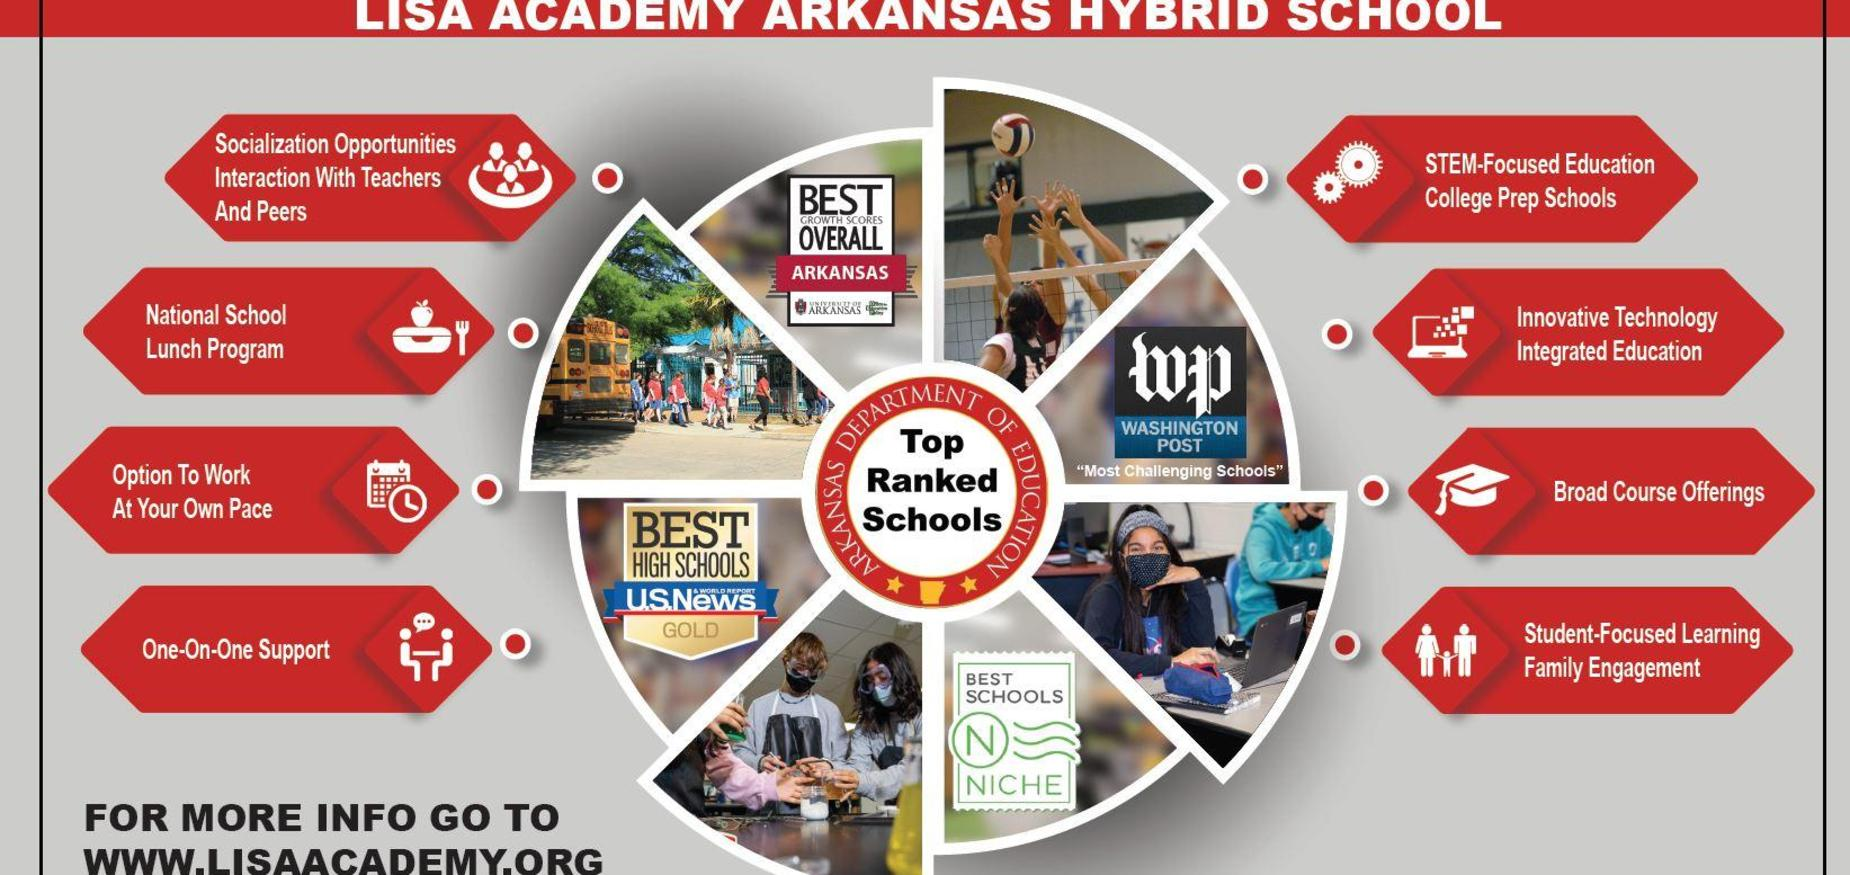 Hybrid School Graphic 2